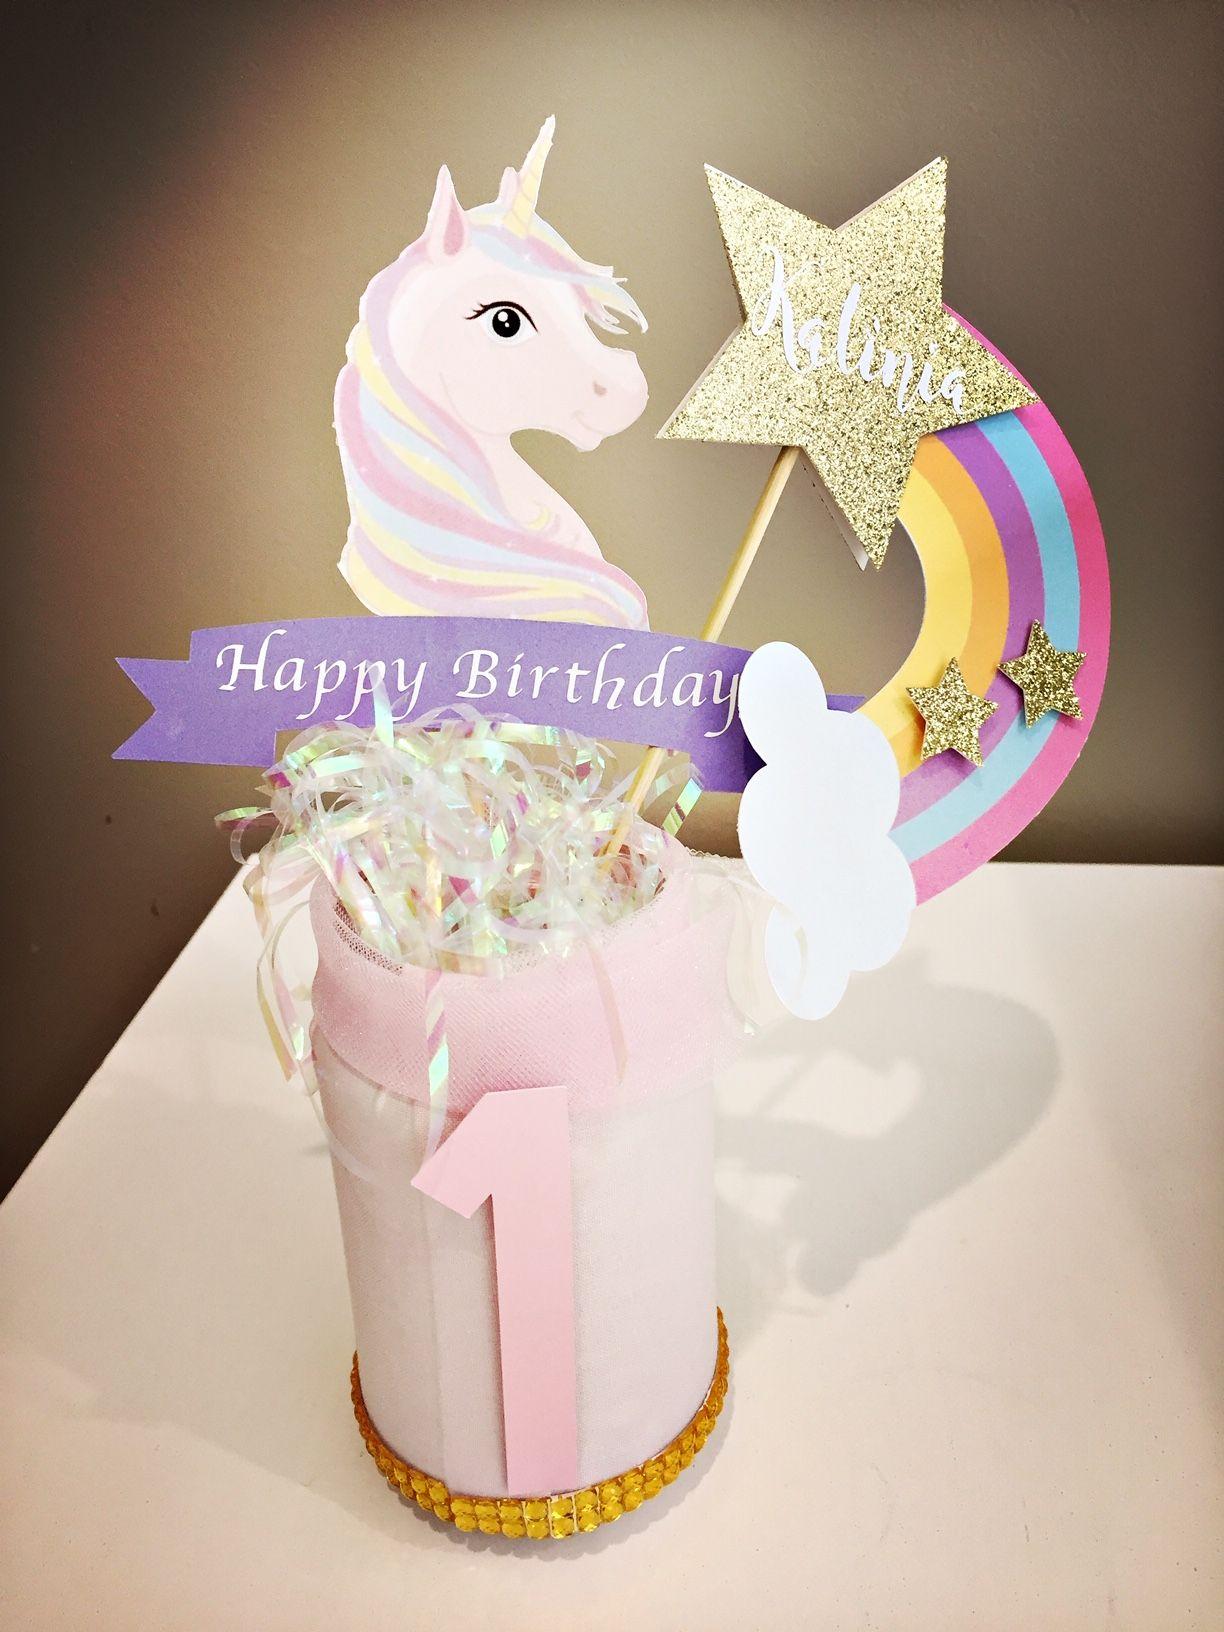 Unicorn party, unicorn party centrepieces, unicorn party